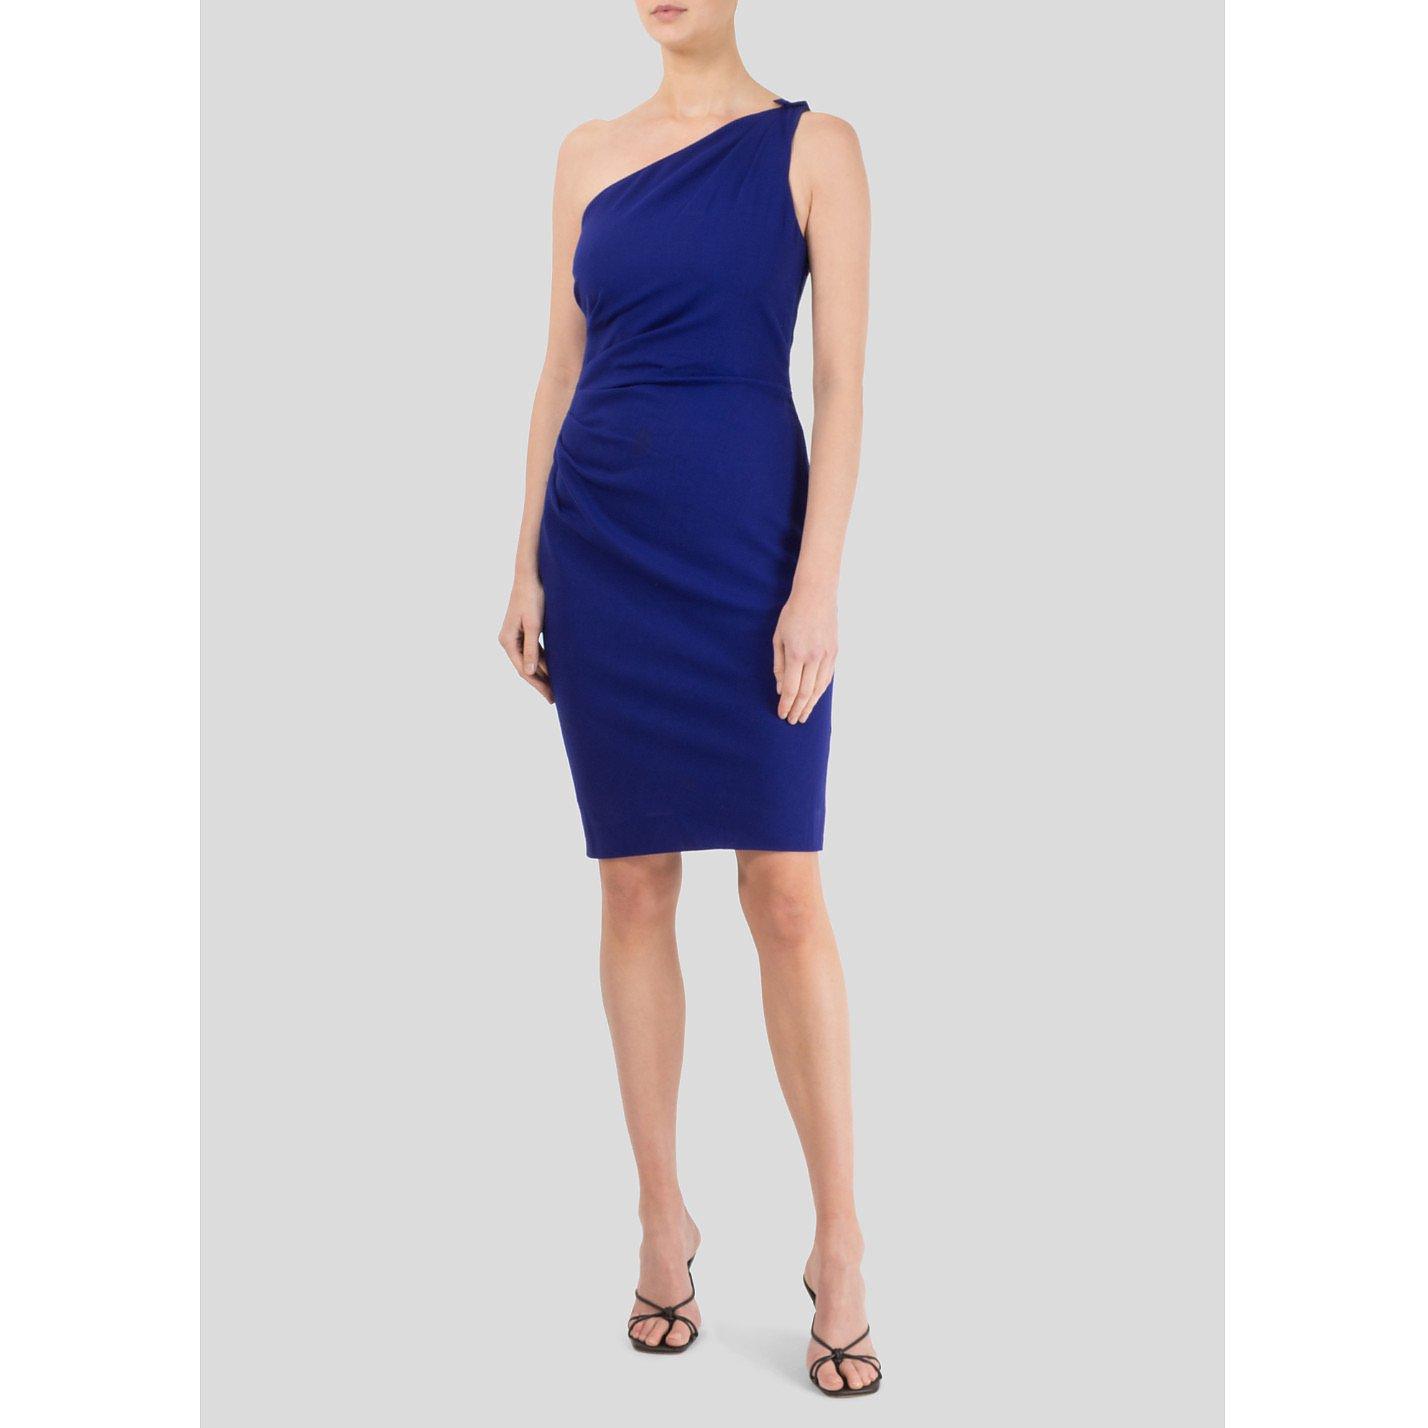 Lois Azzaro One Shoulder Dress